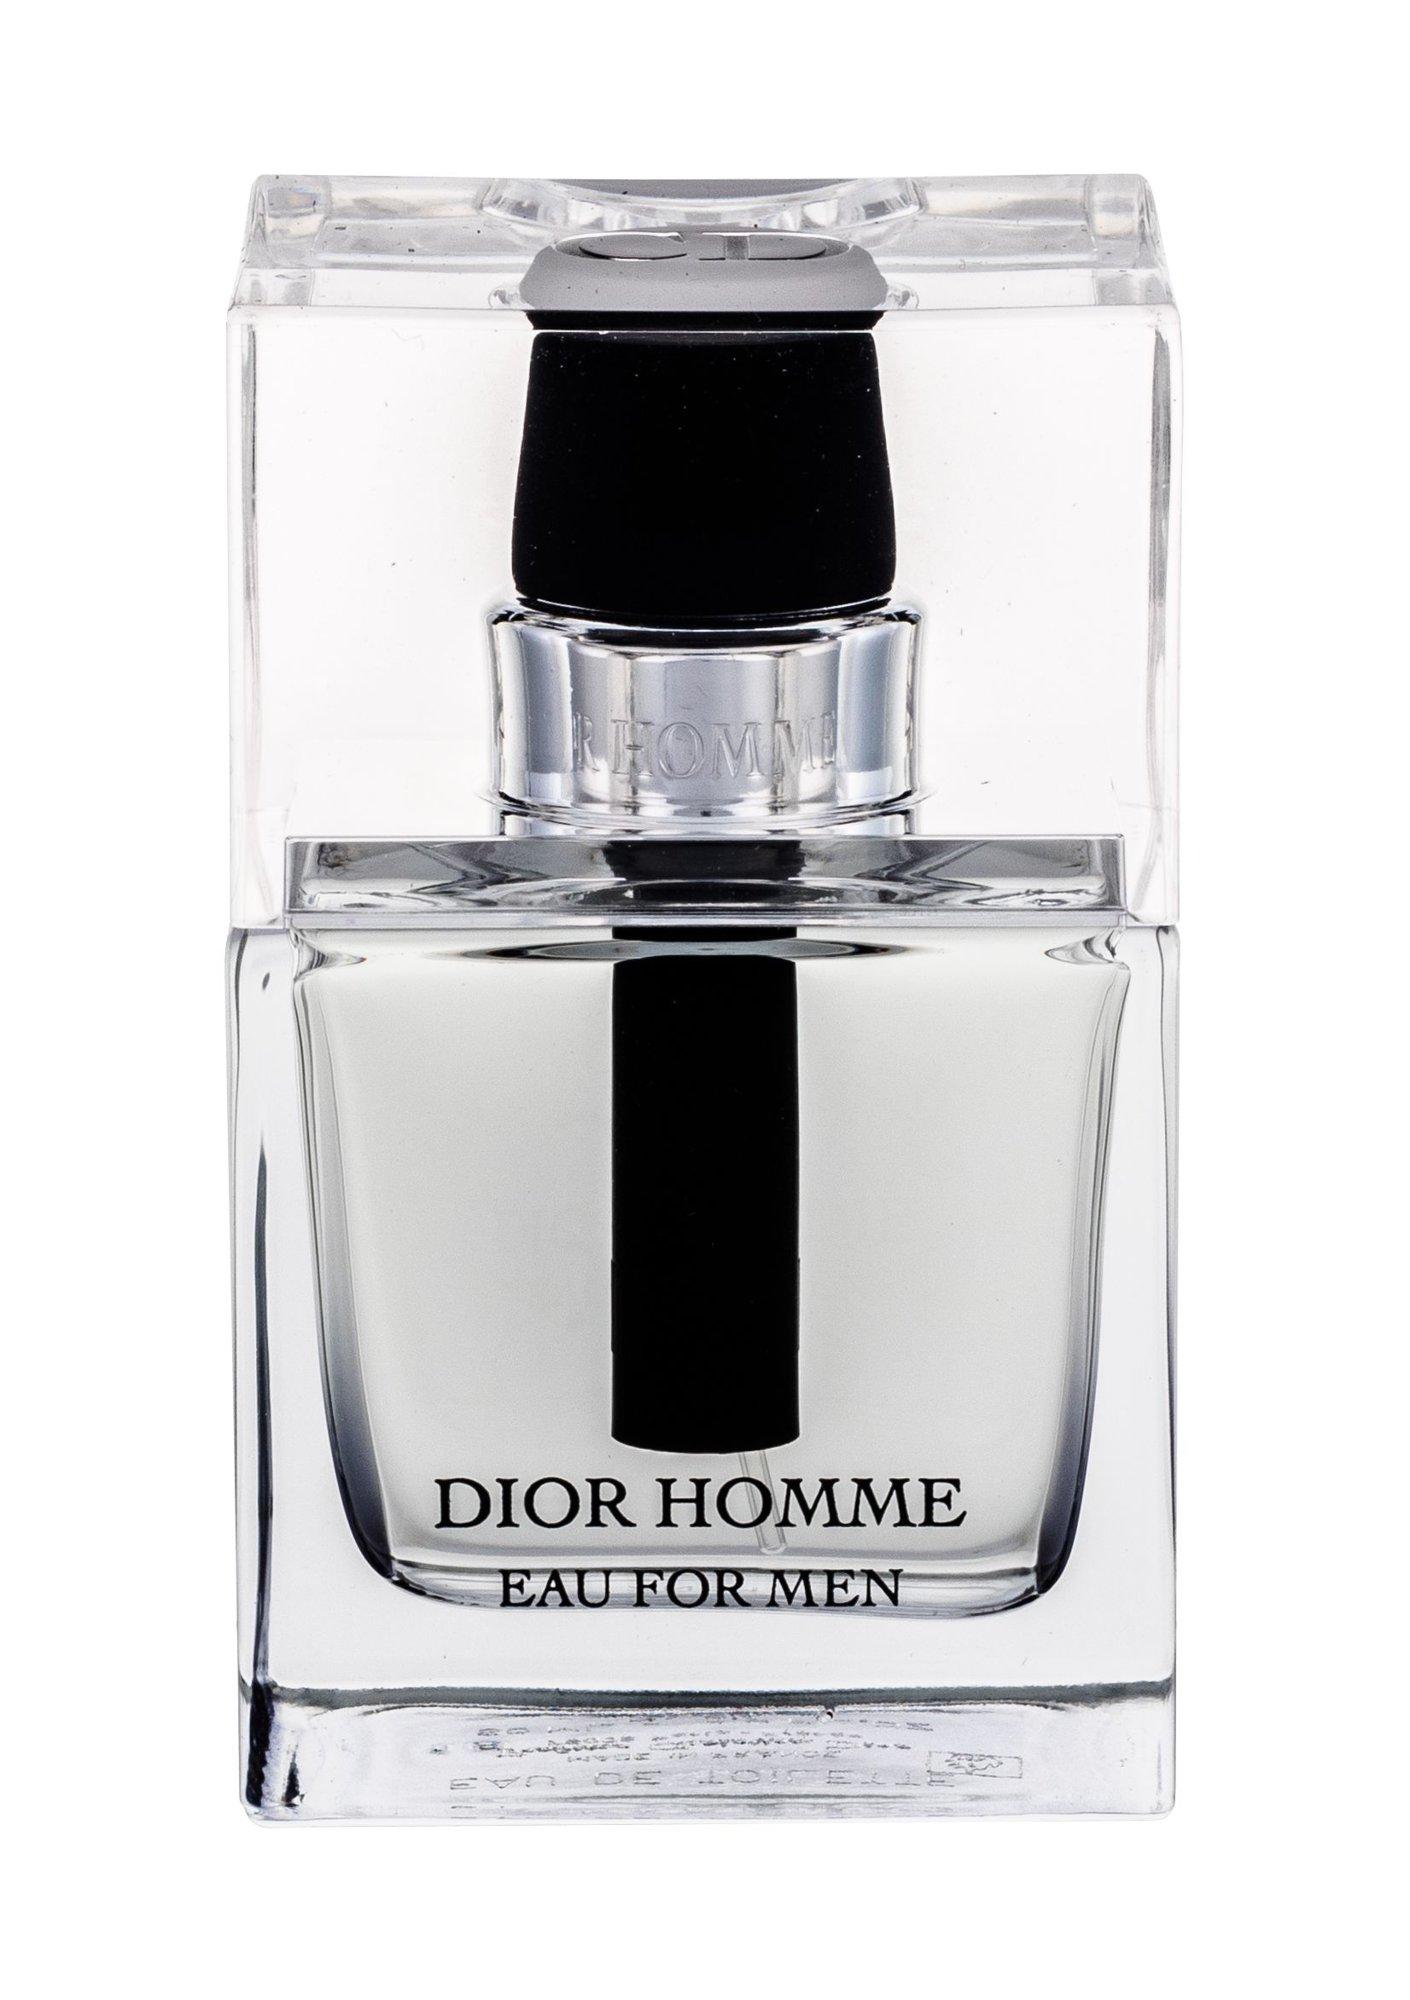 Christian Dior Dior Homme Eau For Men EDT 50ml